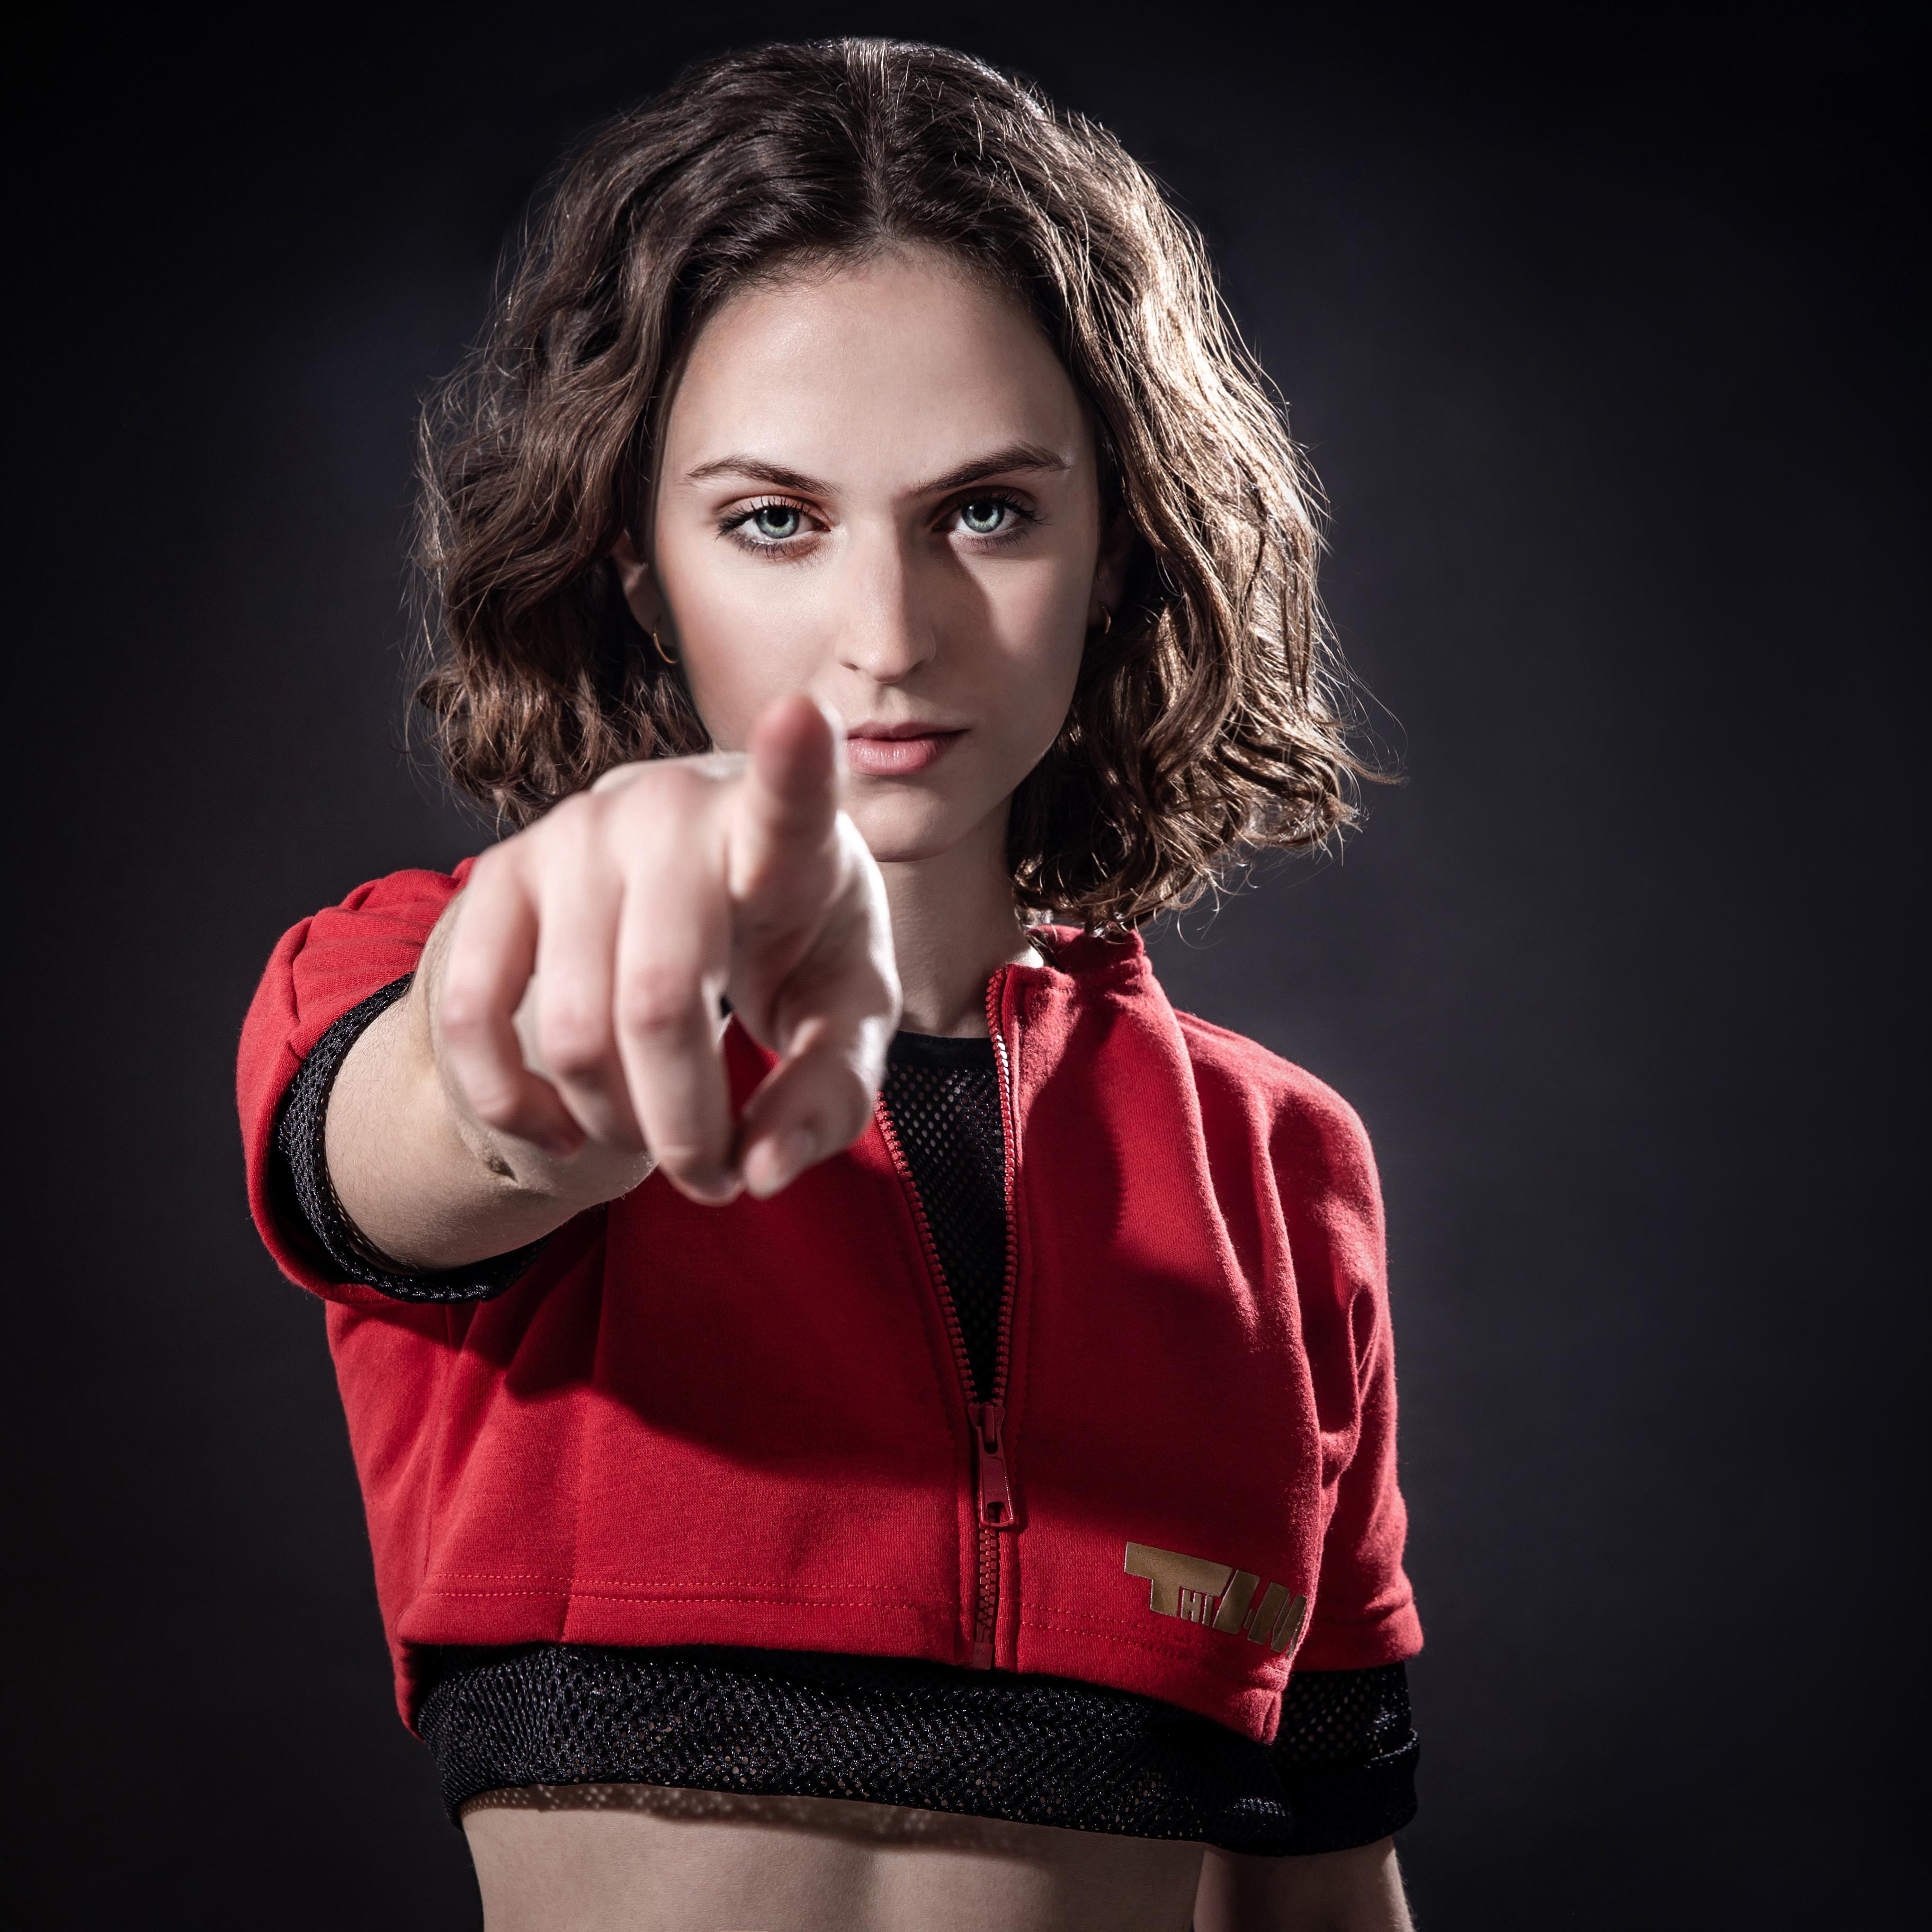 2xME female hoodie red 2in1 B_2xme_F_19_01red